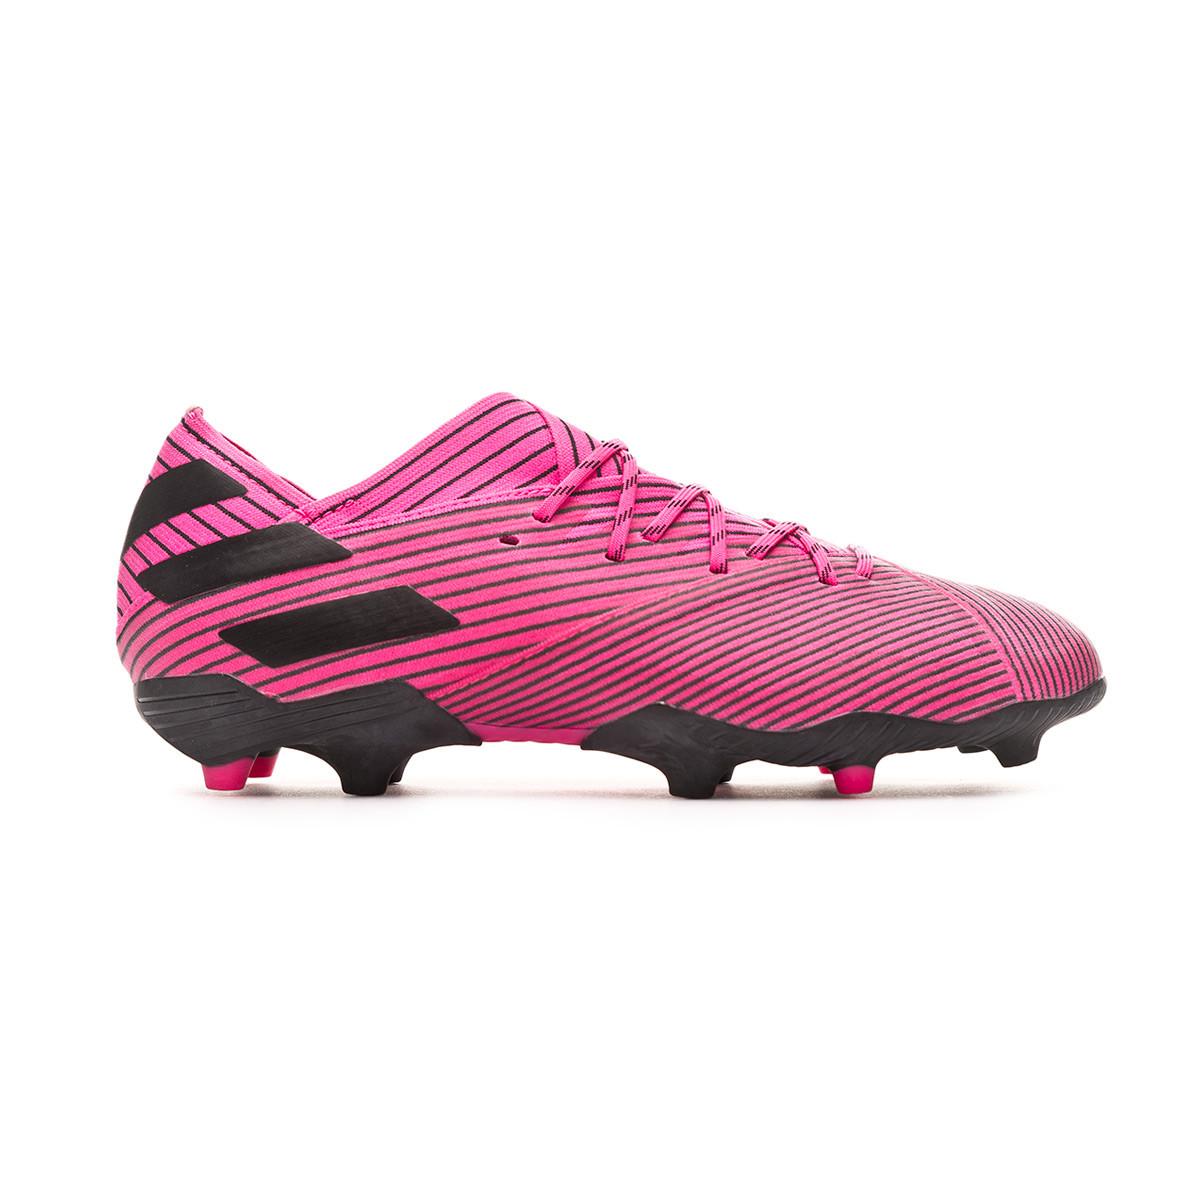 Chaussure de foot adidas Nemeziz 19.1 FG Niño